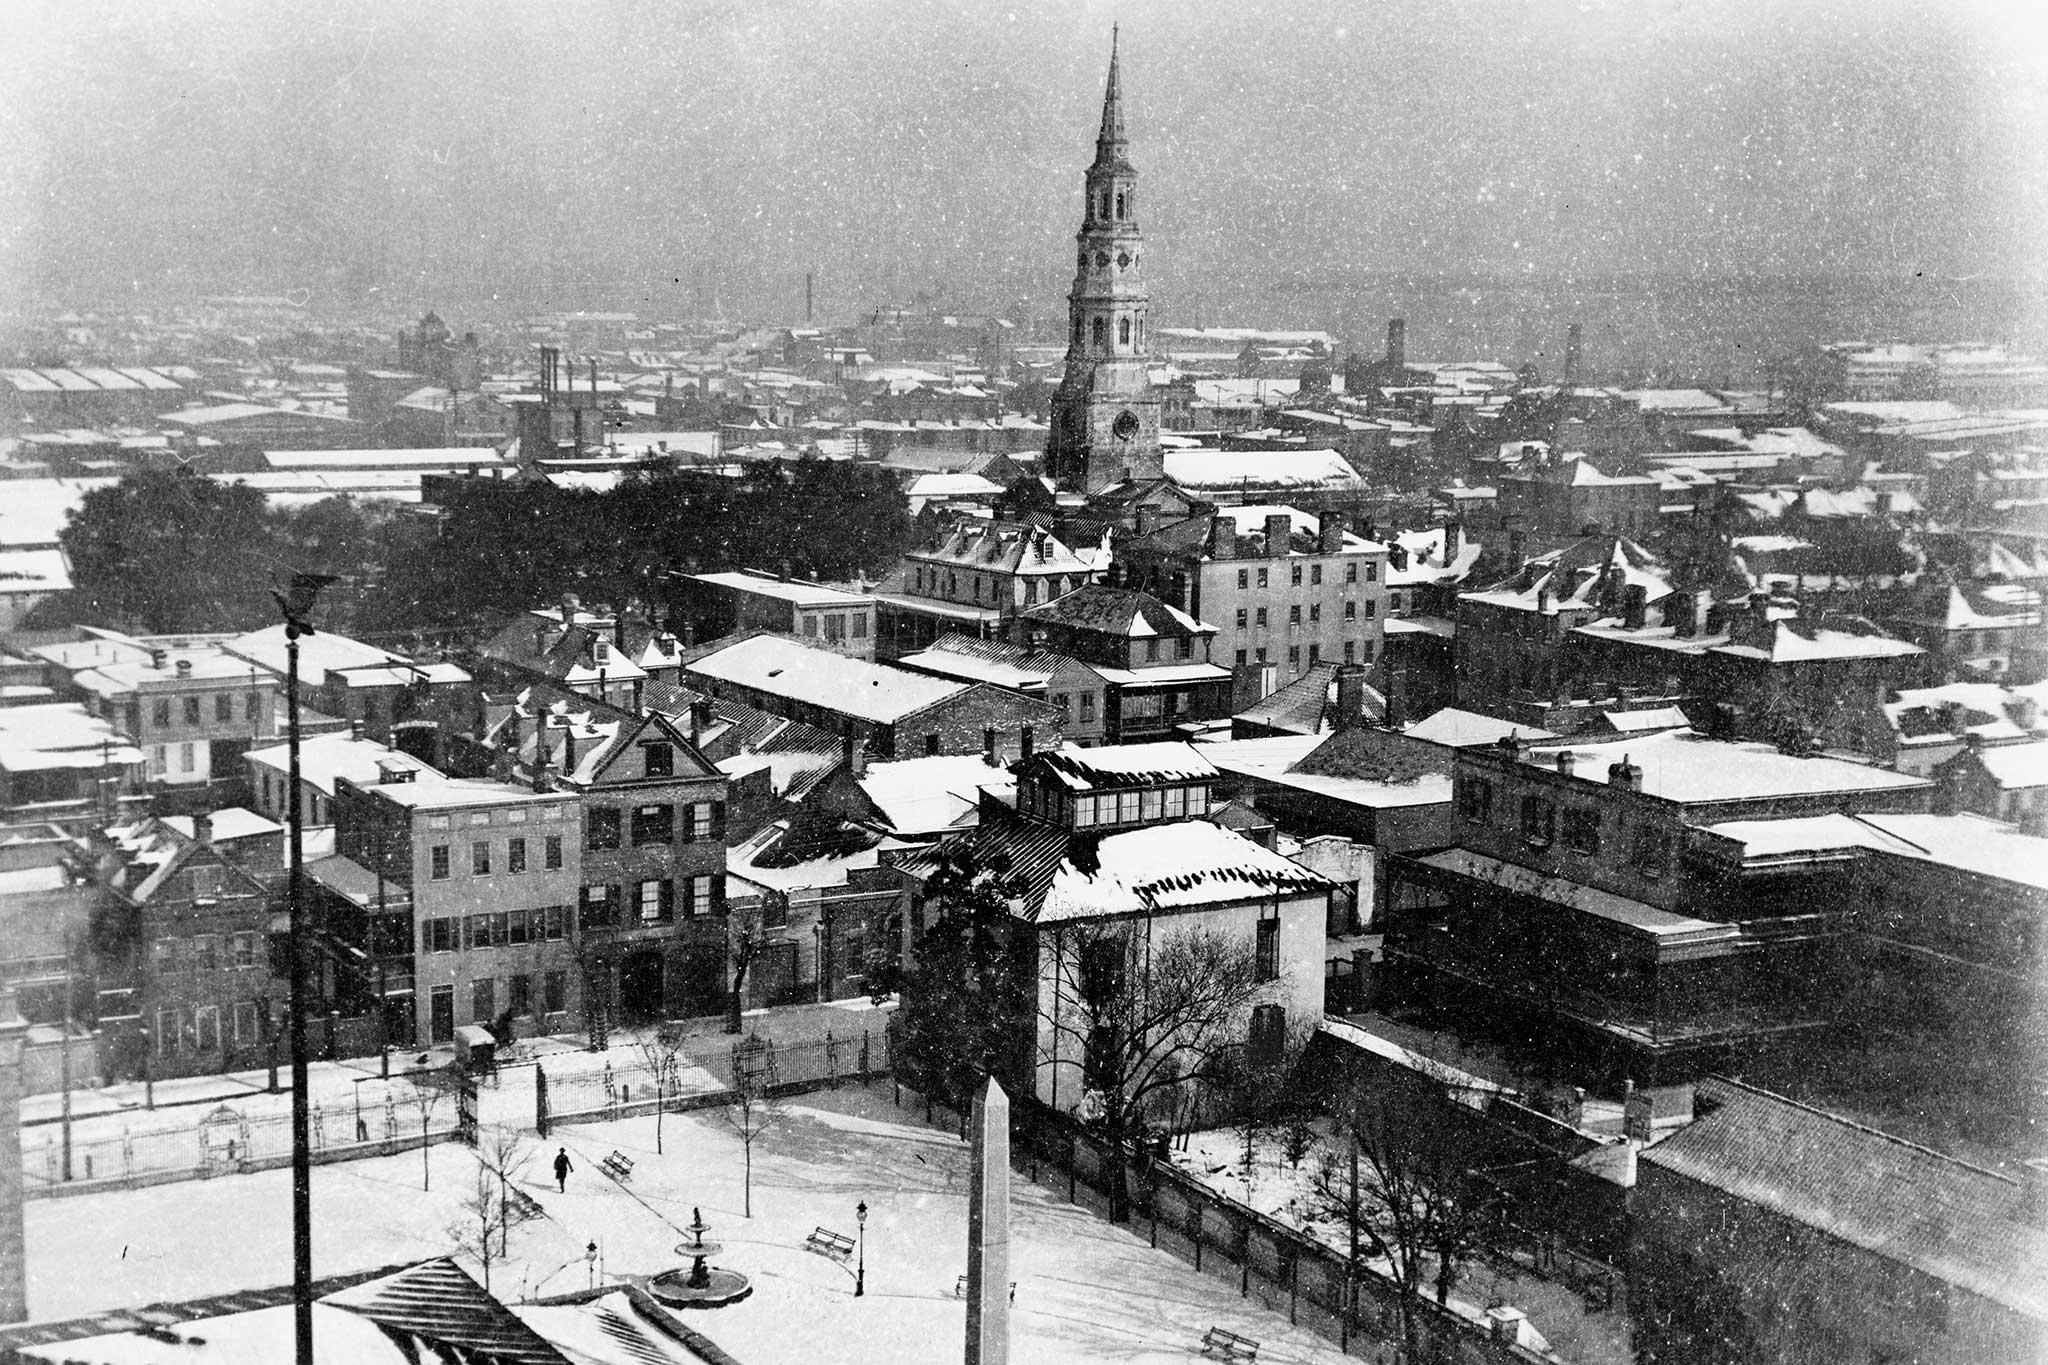 Homeschool History Day: Snow Science